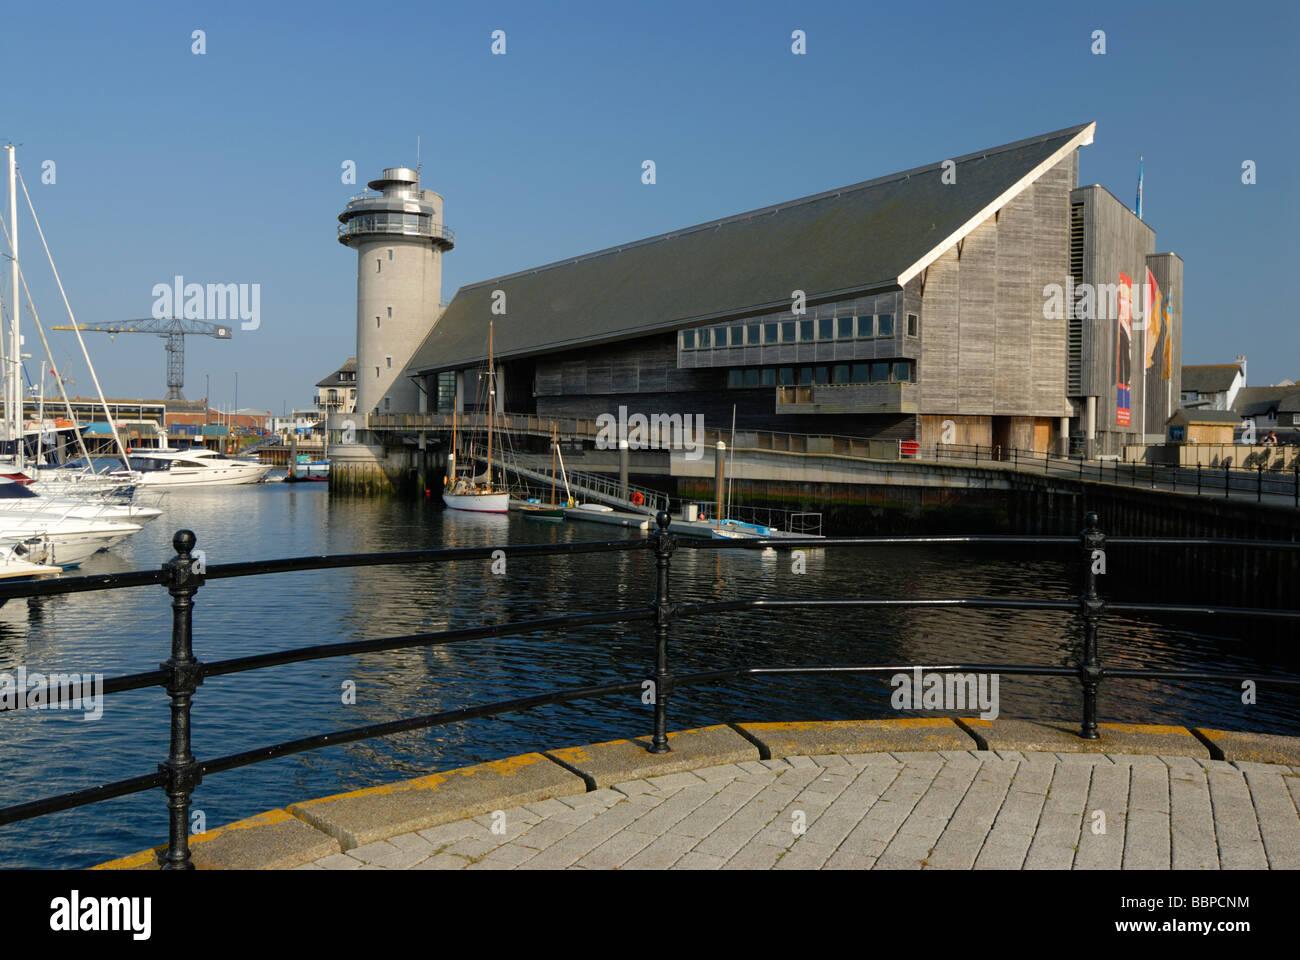 National Maritime Museum Falmouth Cornwall UK - Stock Image